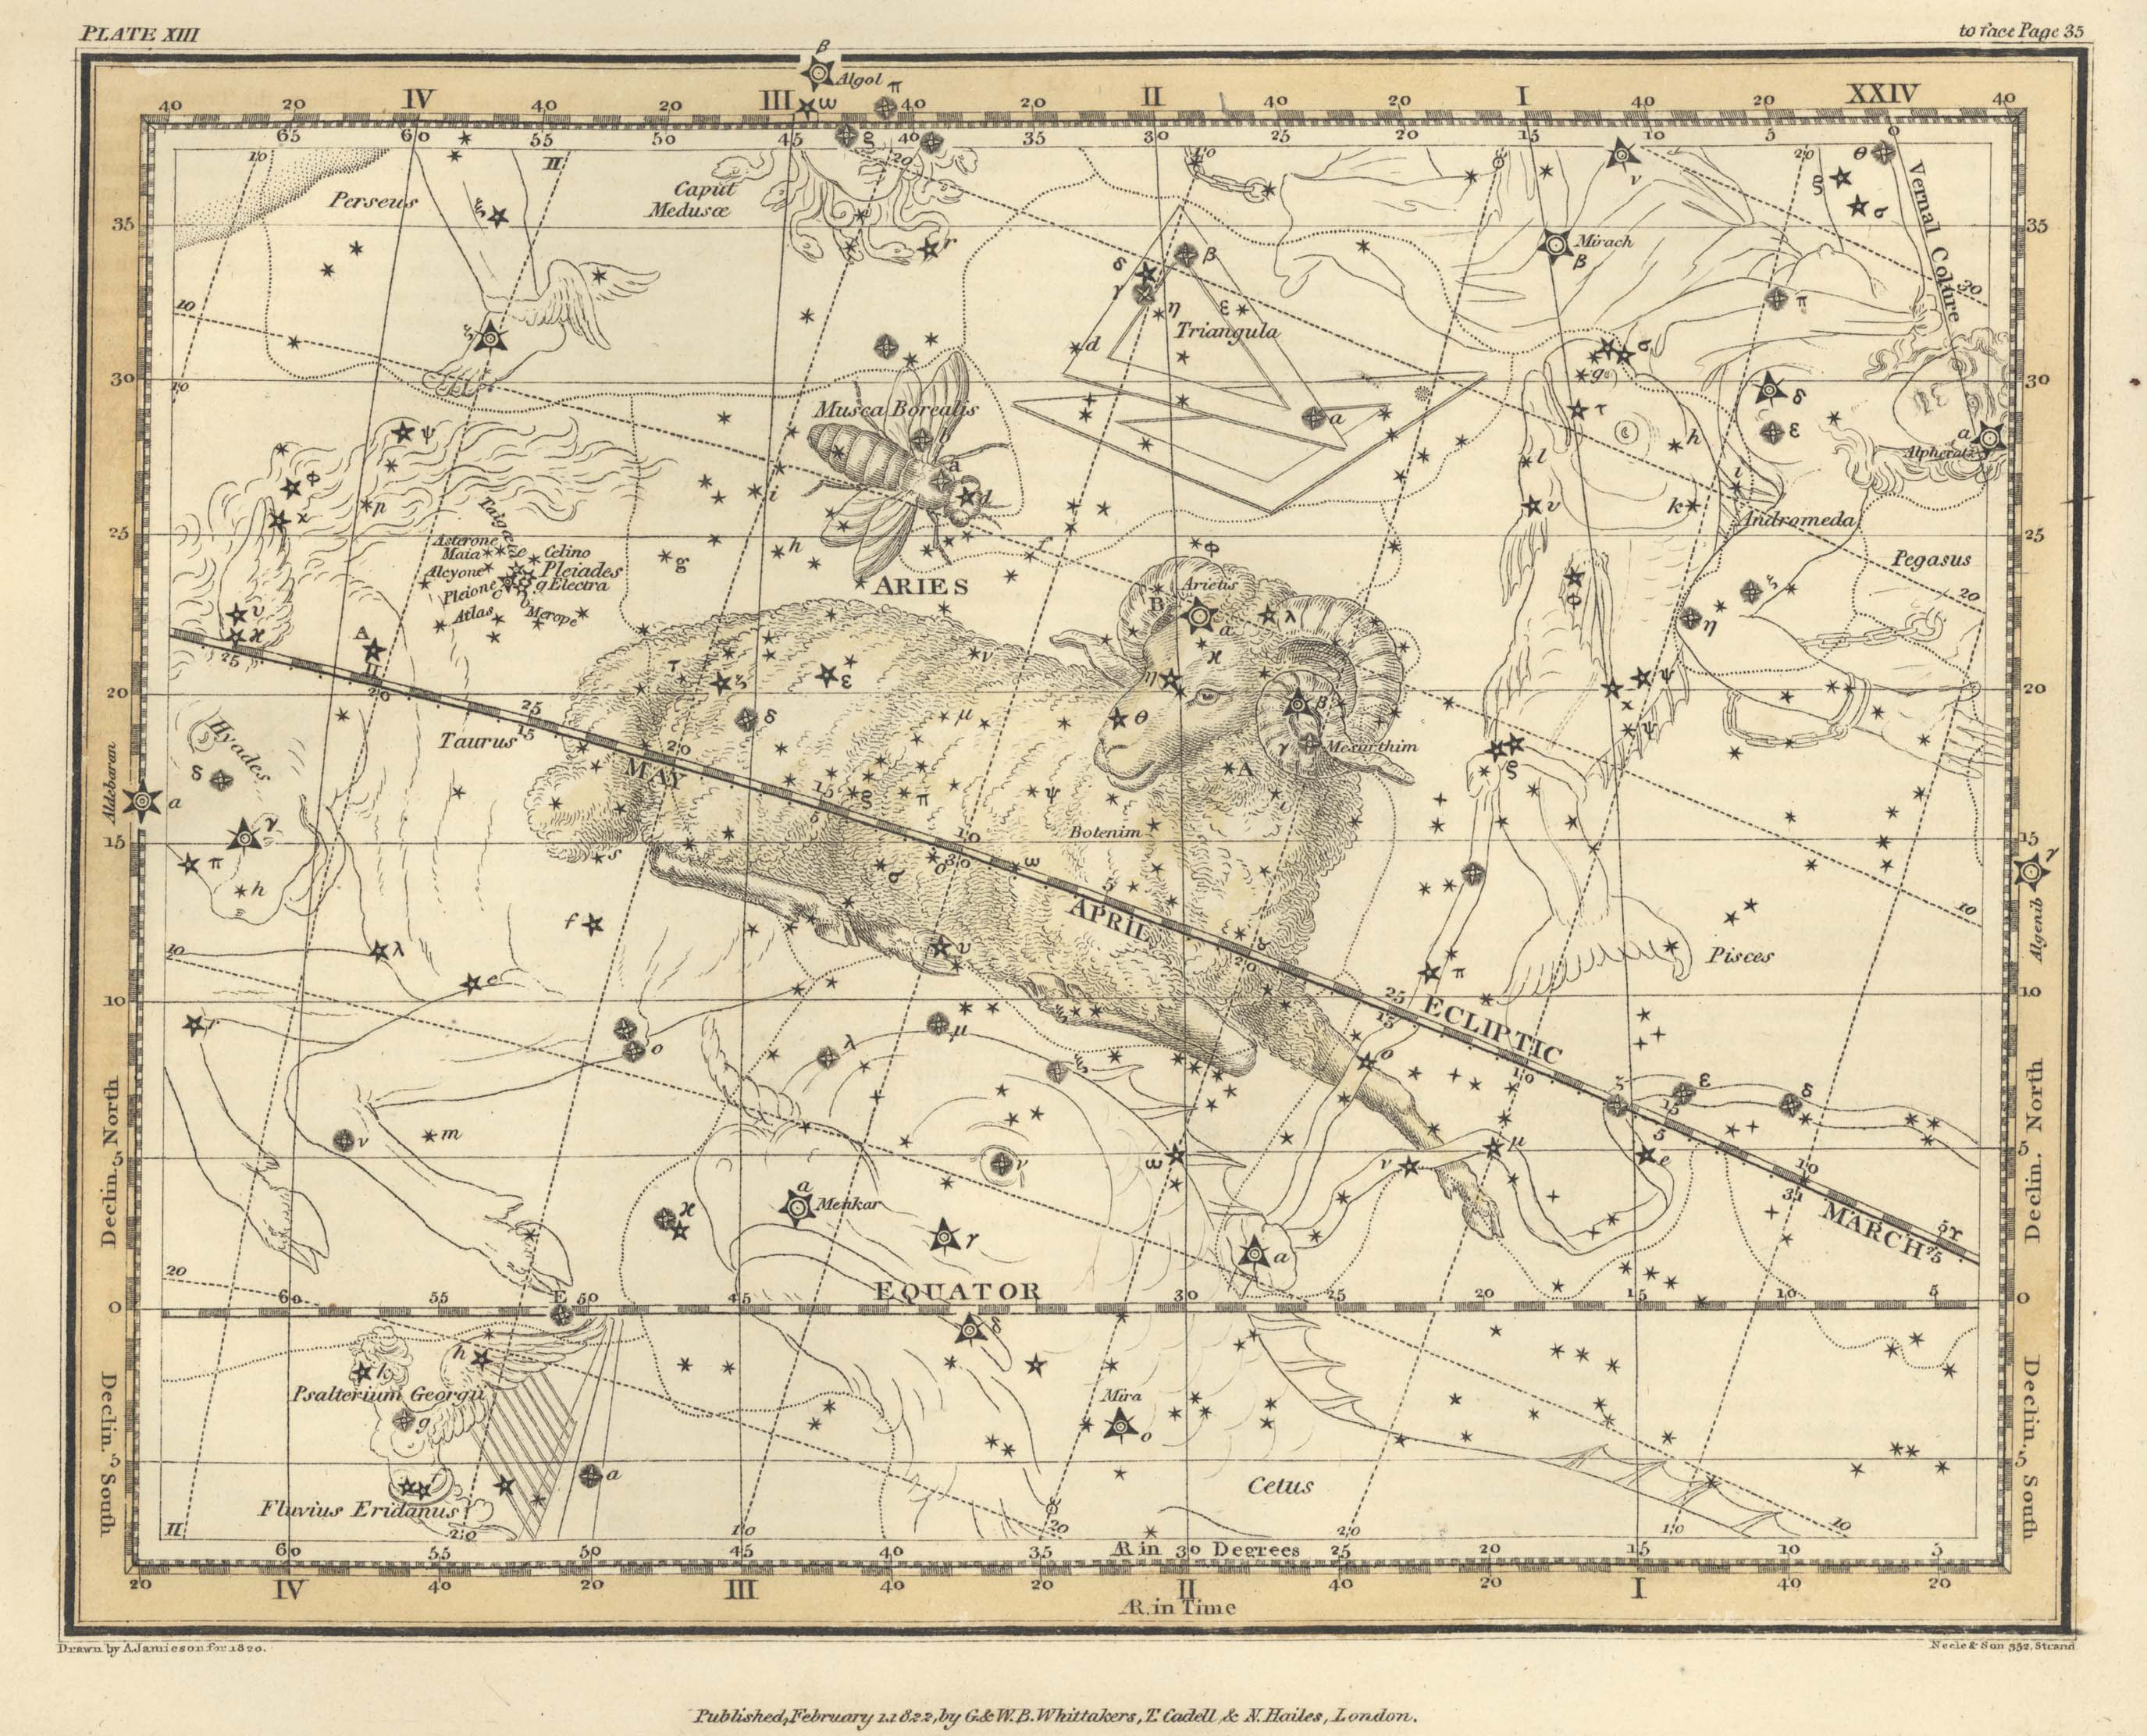 Страница №16: Овен и Северная Муха